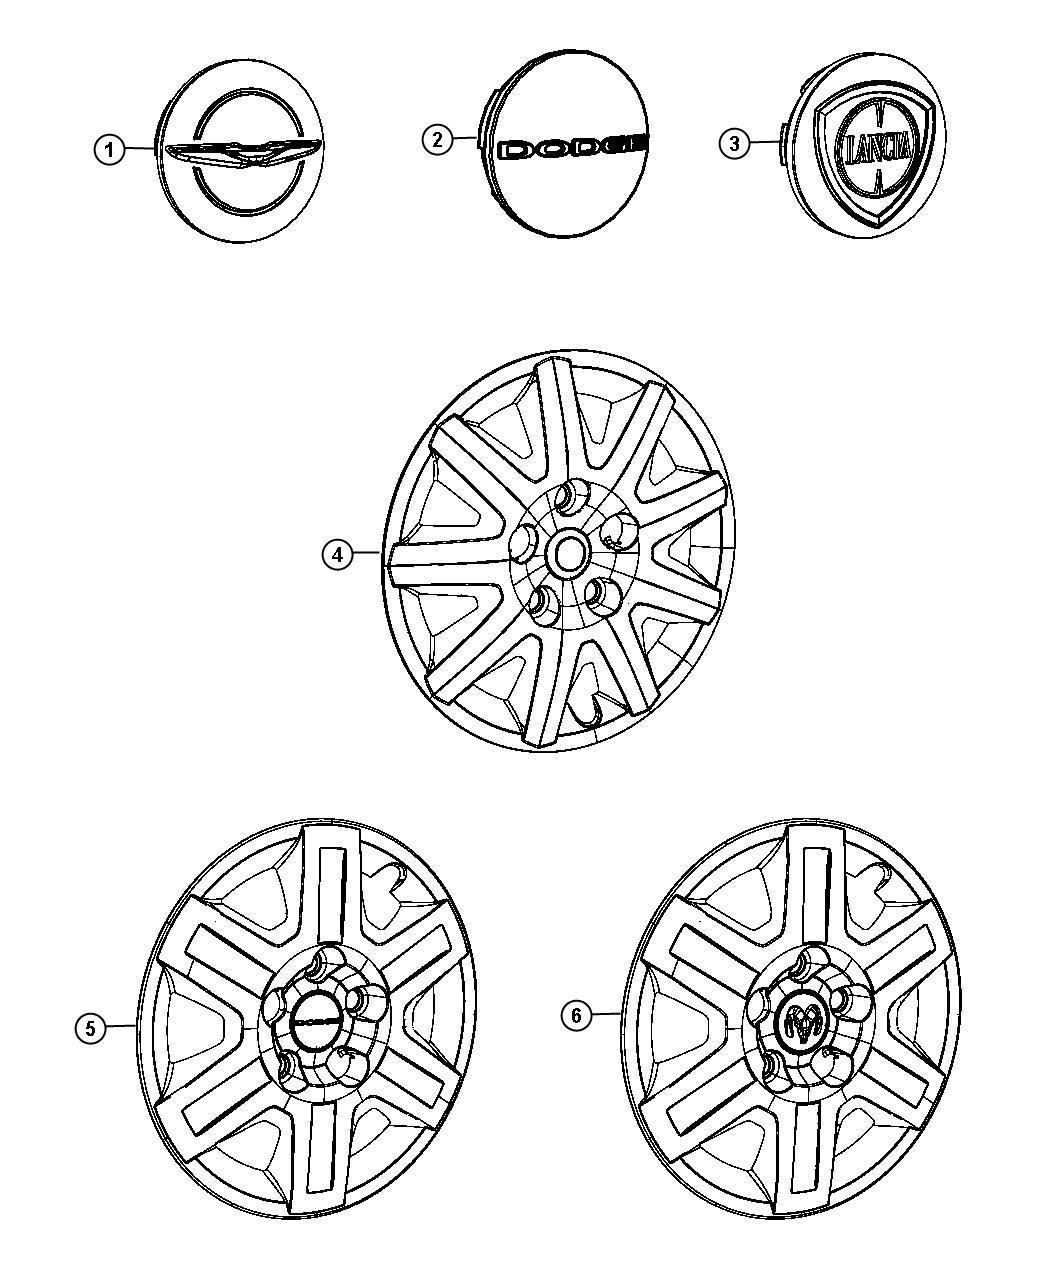 2012 Dodge Grand Caravan Cover. Wheel. Covers, inch